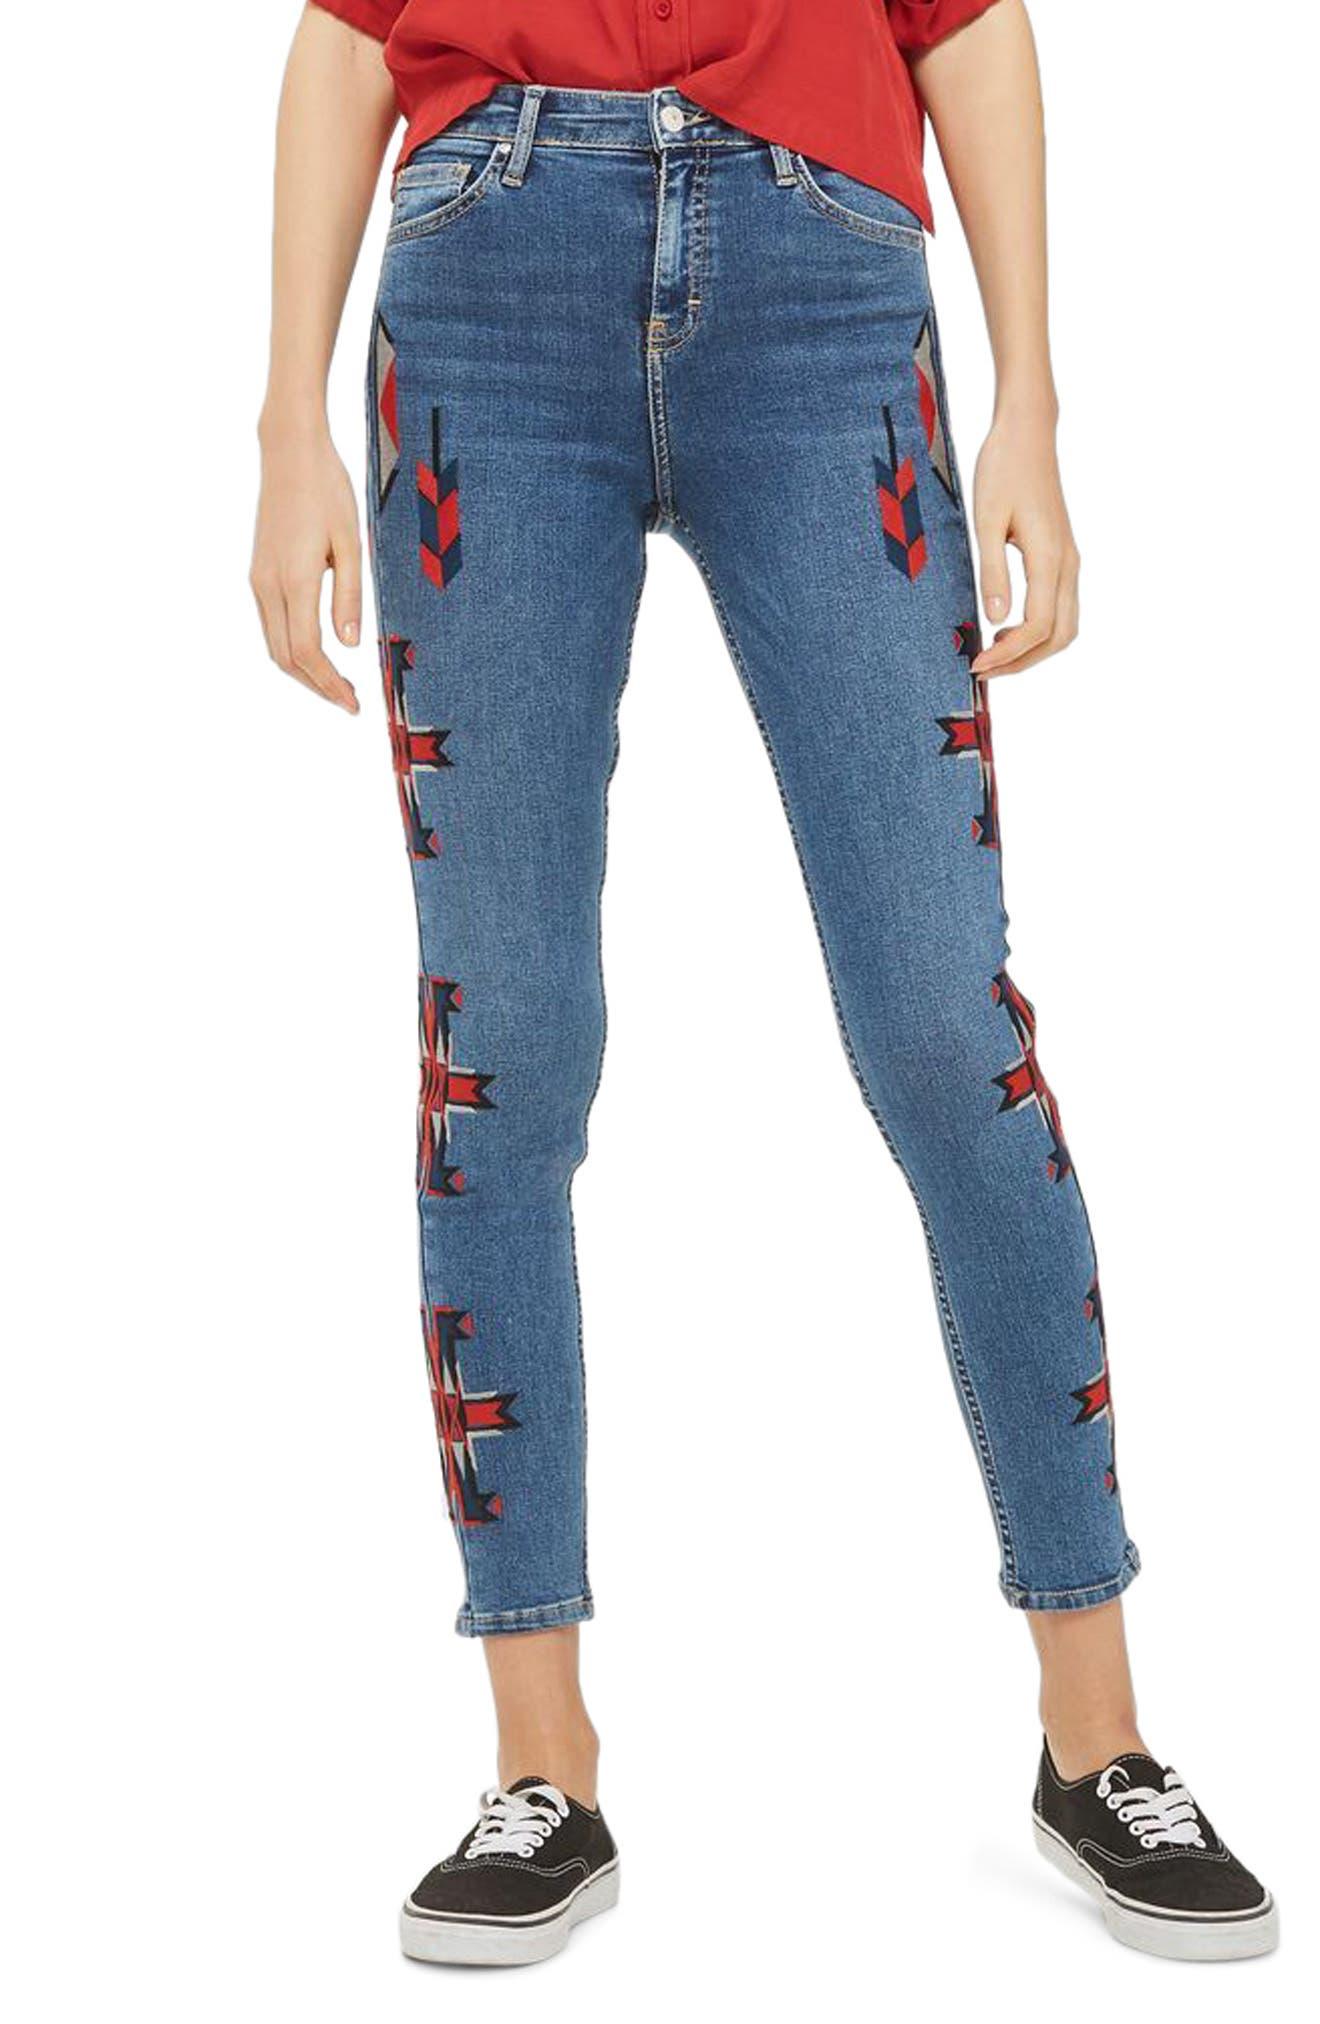 Topshop Jamie Embroidered Skinny Jeans